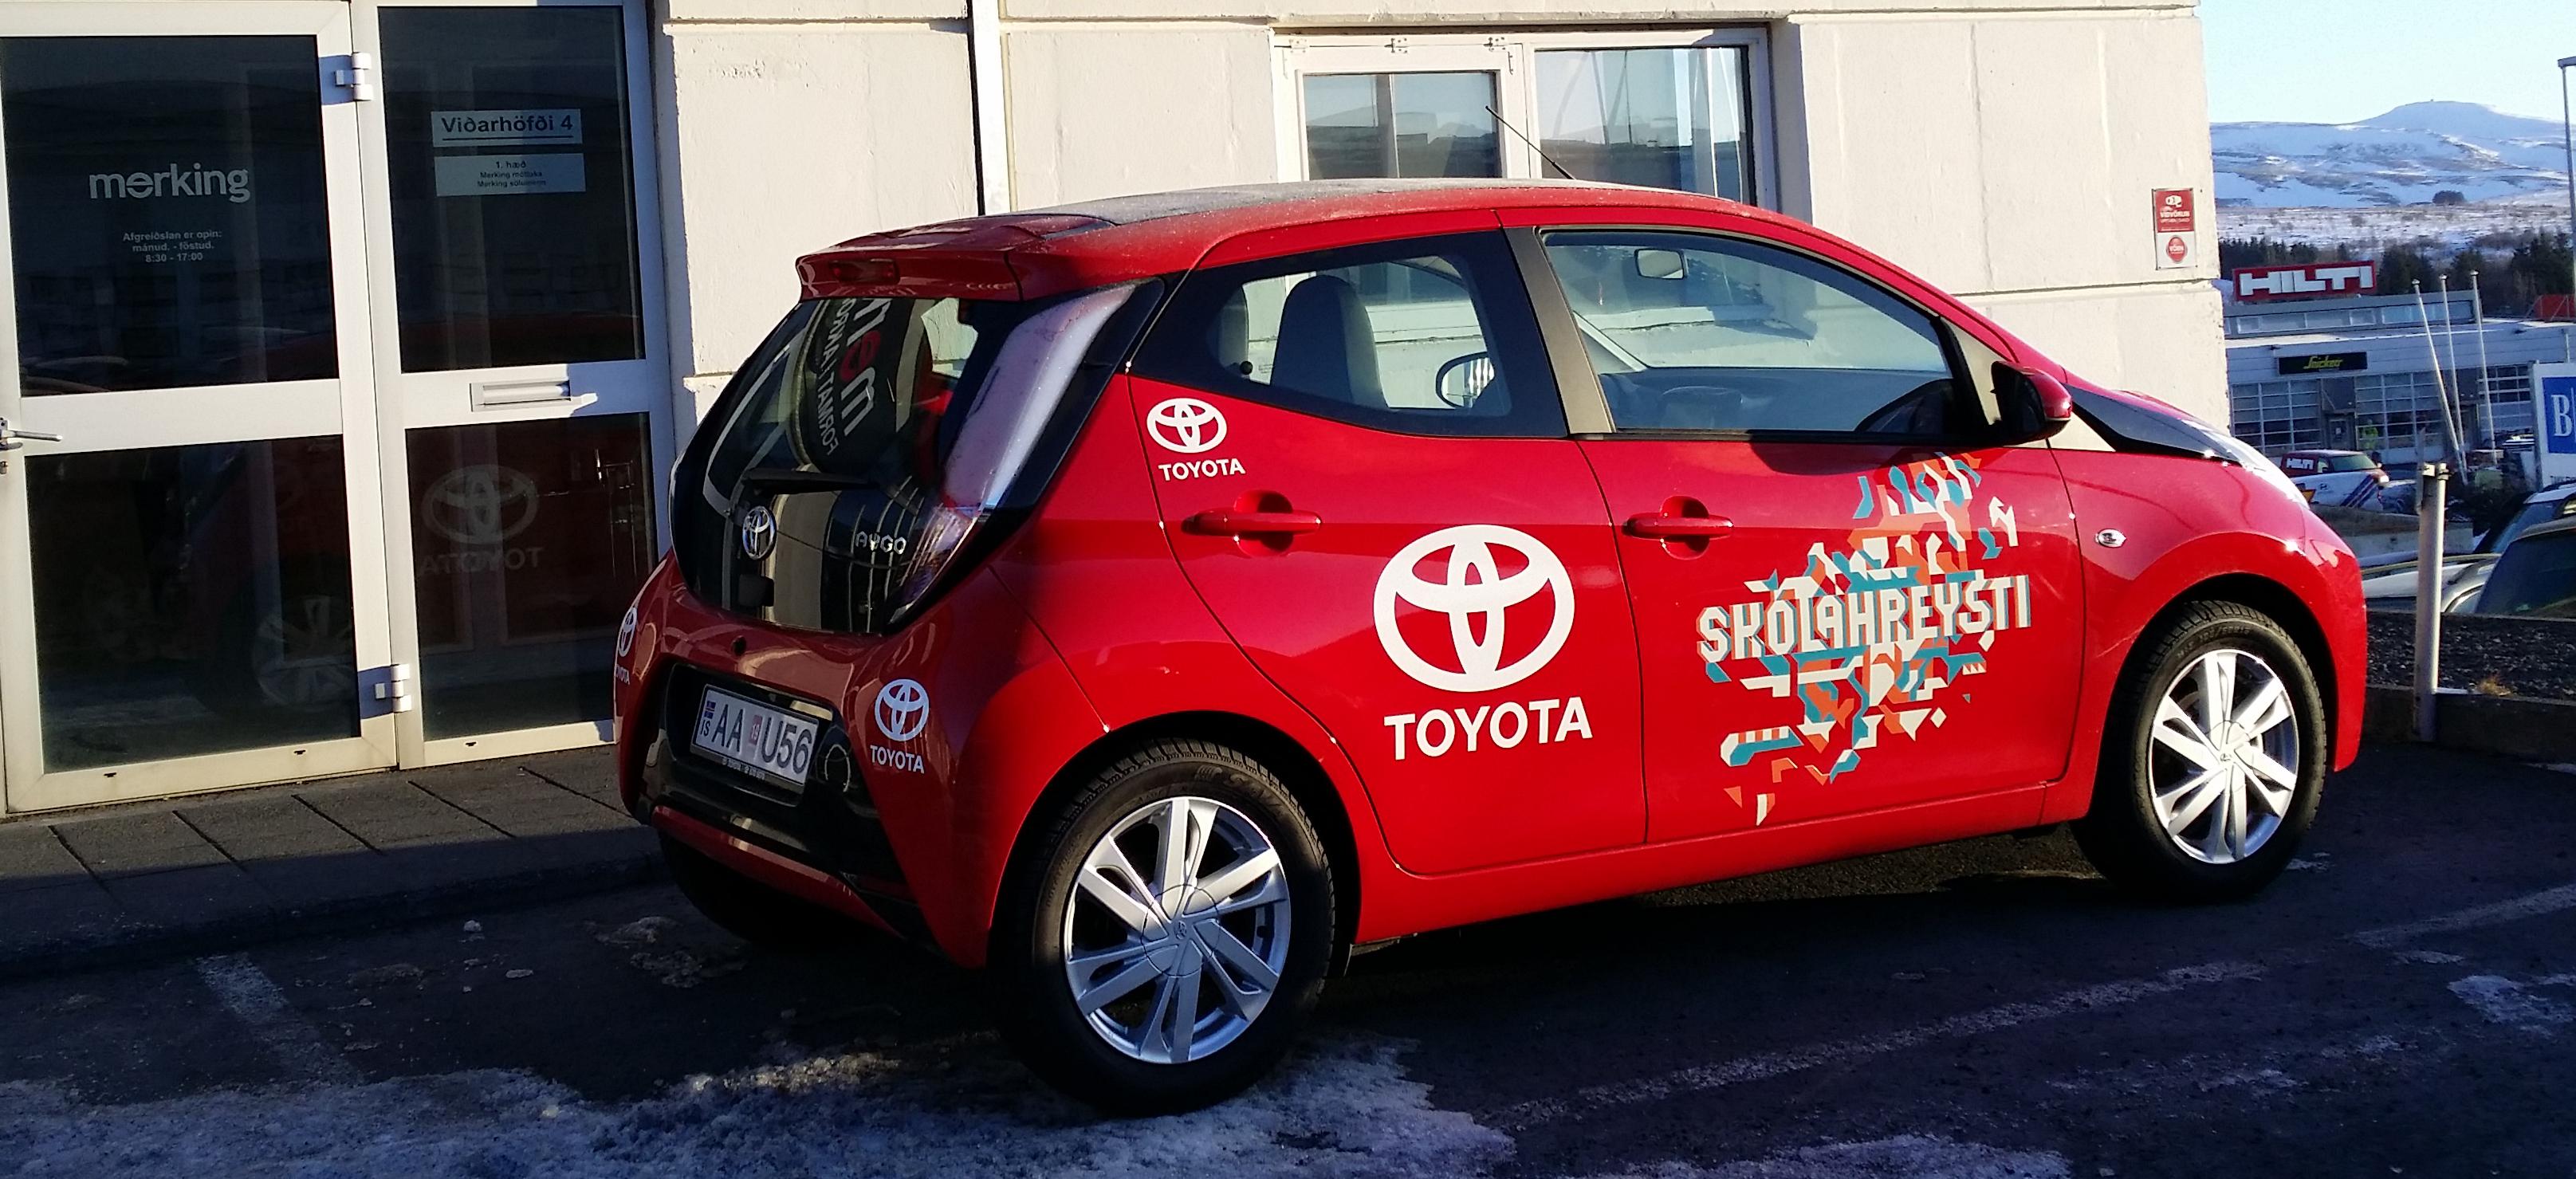 Toyota Skólahreysti